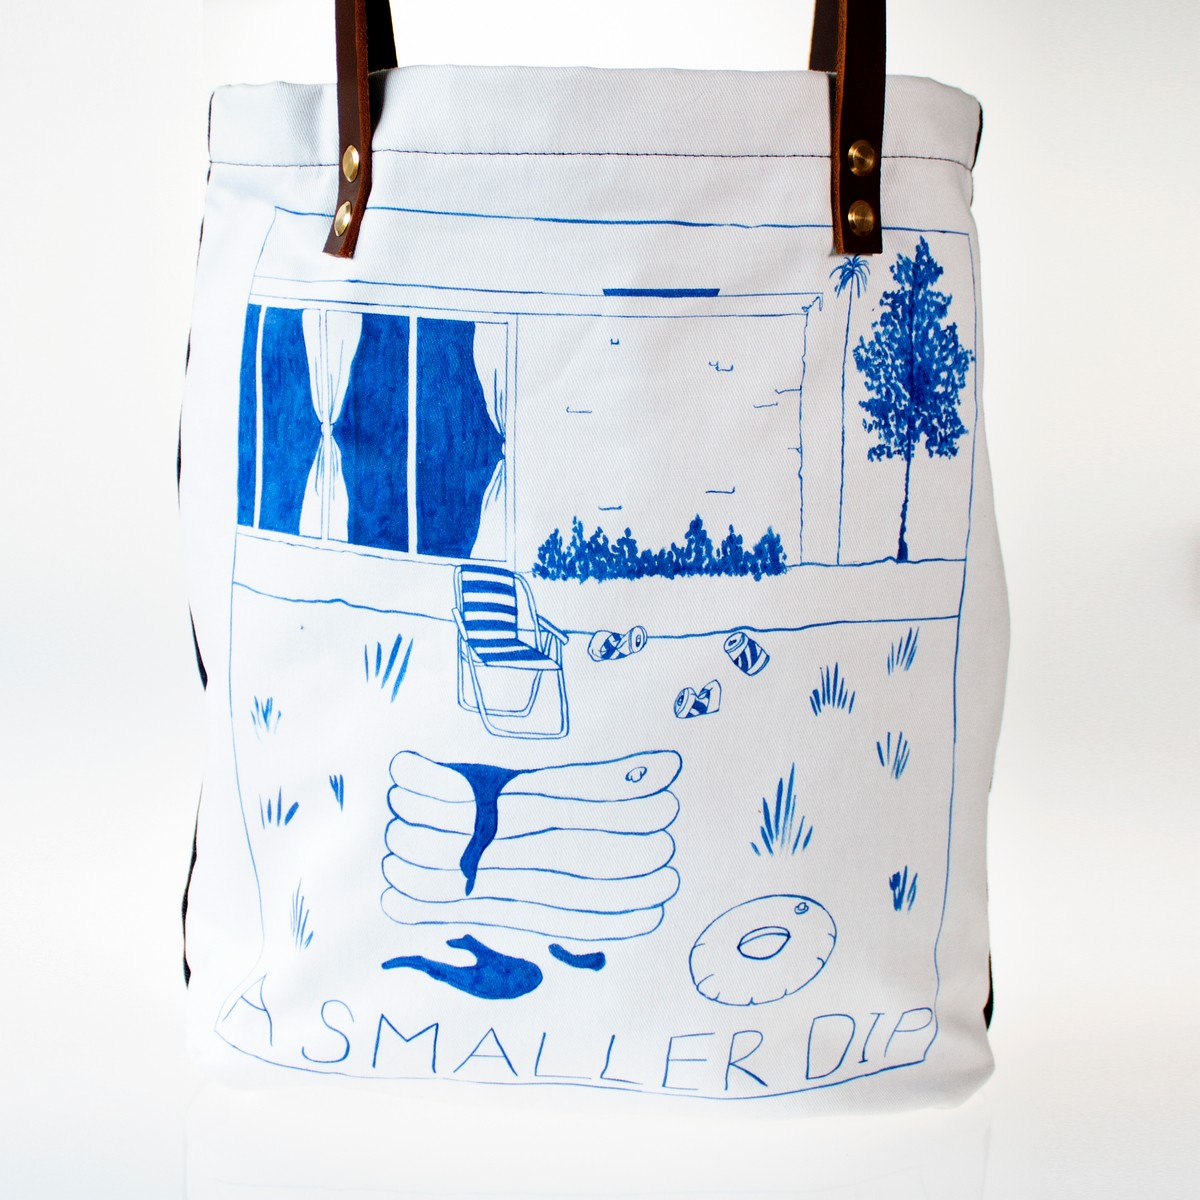 Photo of A Smaller Dip Tote Bag